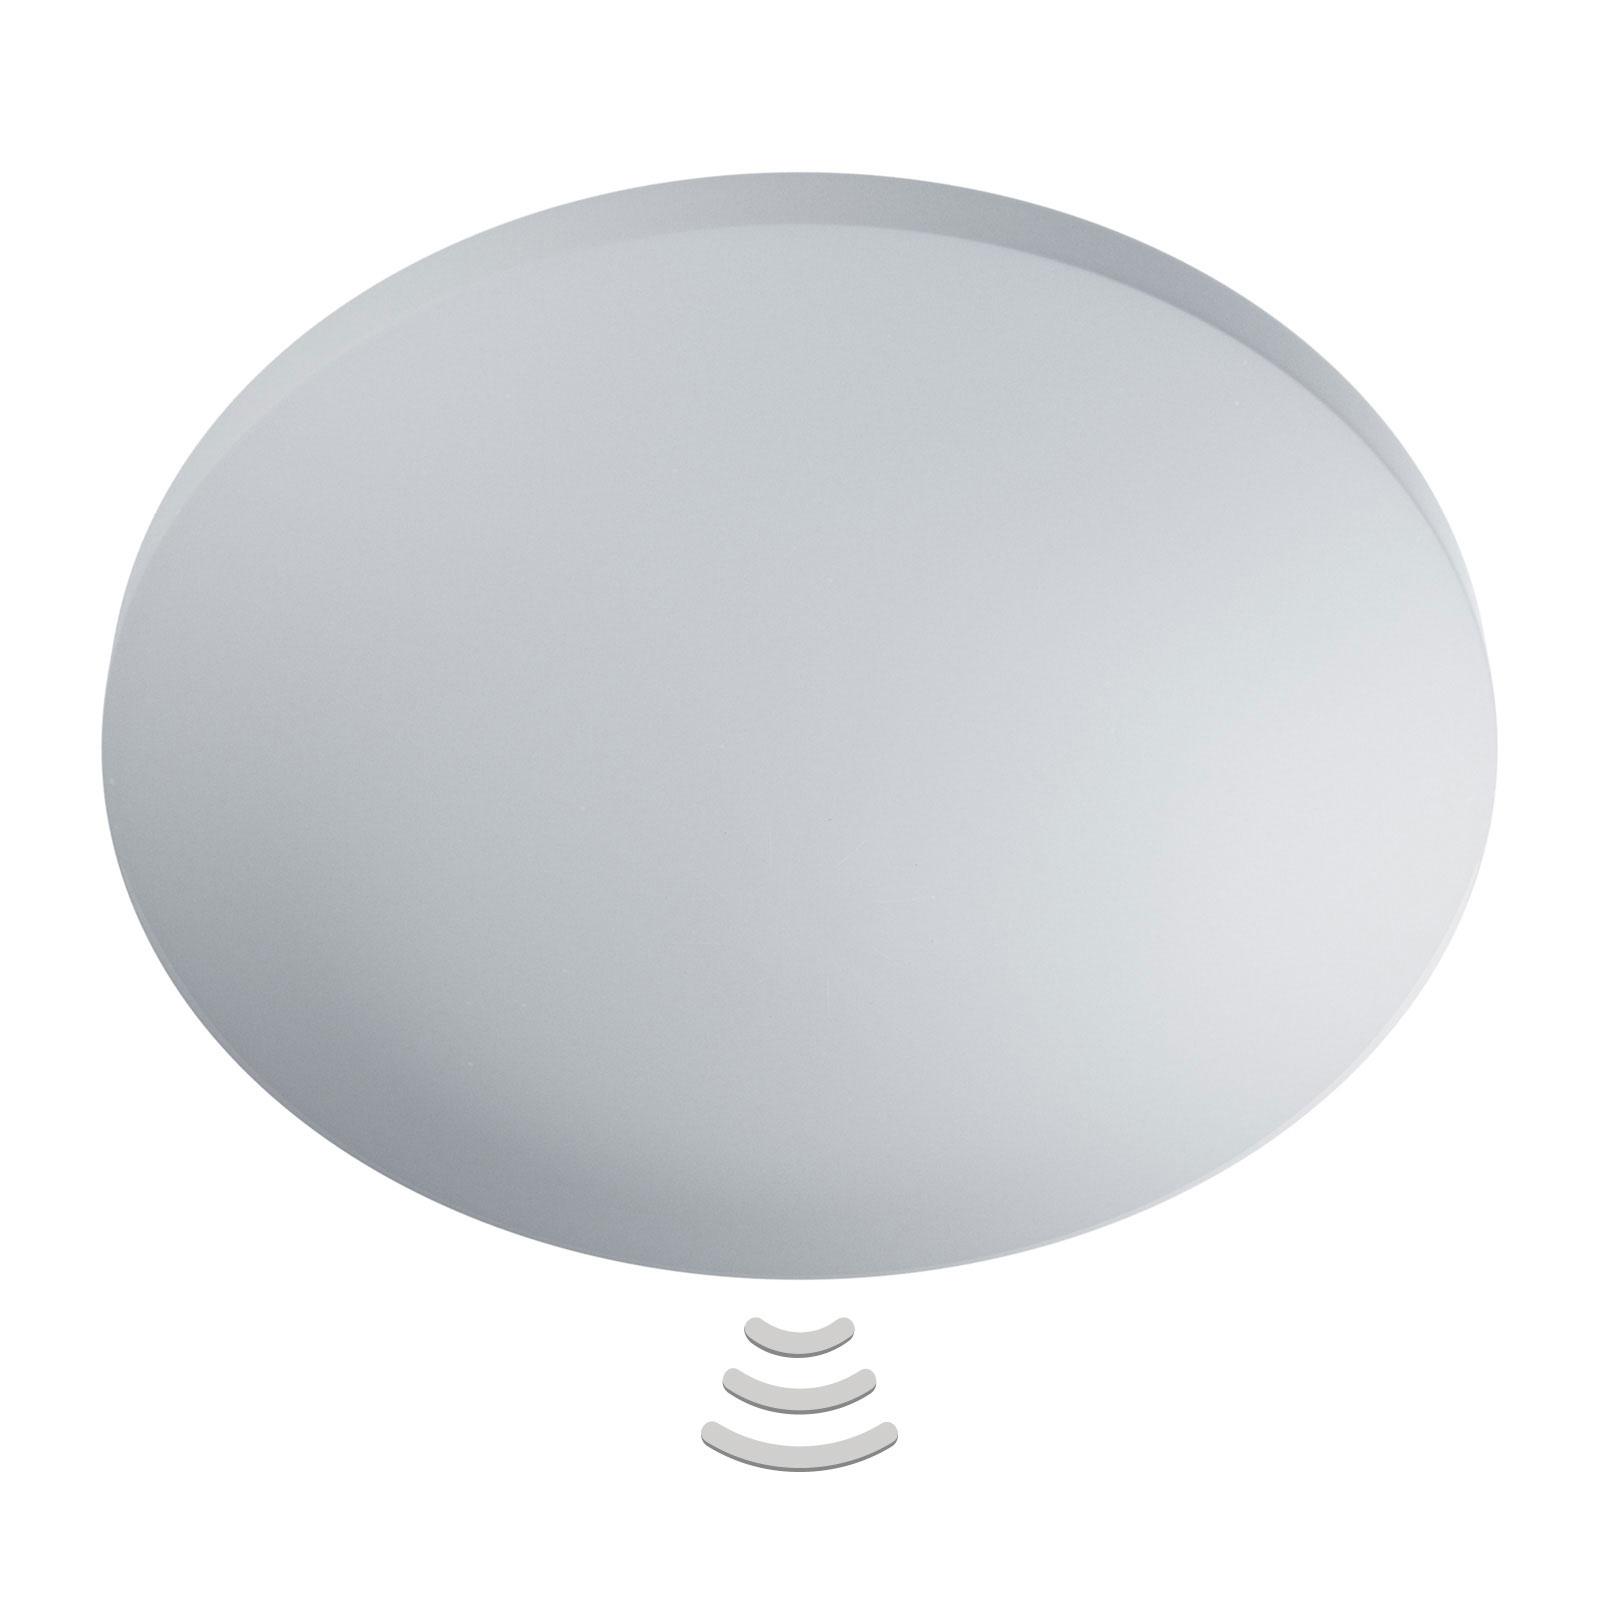 LEDVANCE Orbis lampa sufitowa czujnik IP44 30 cm